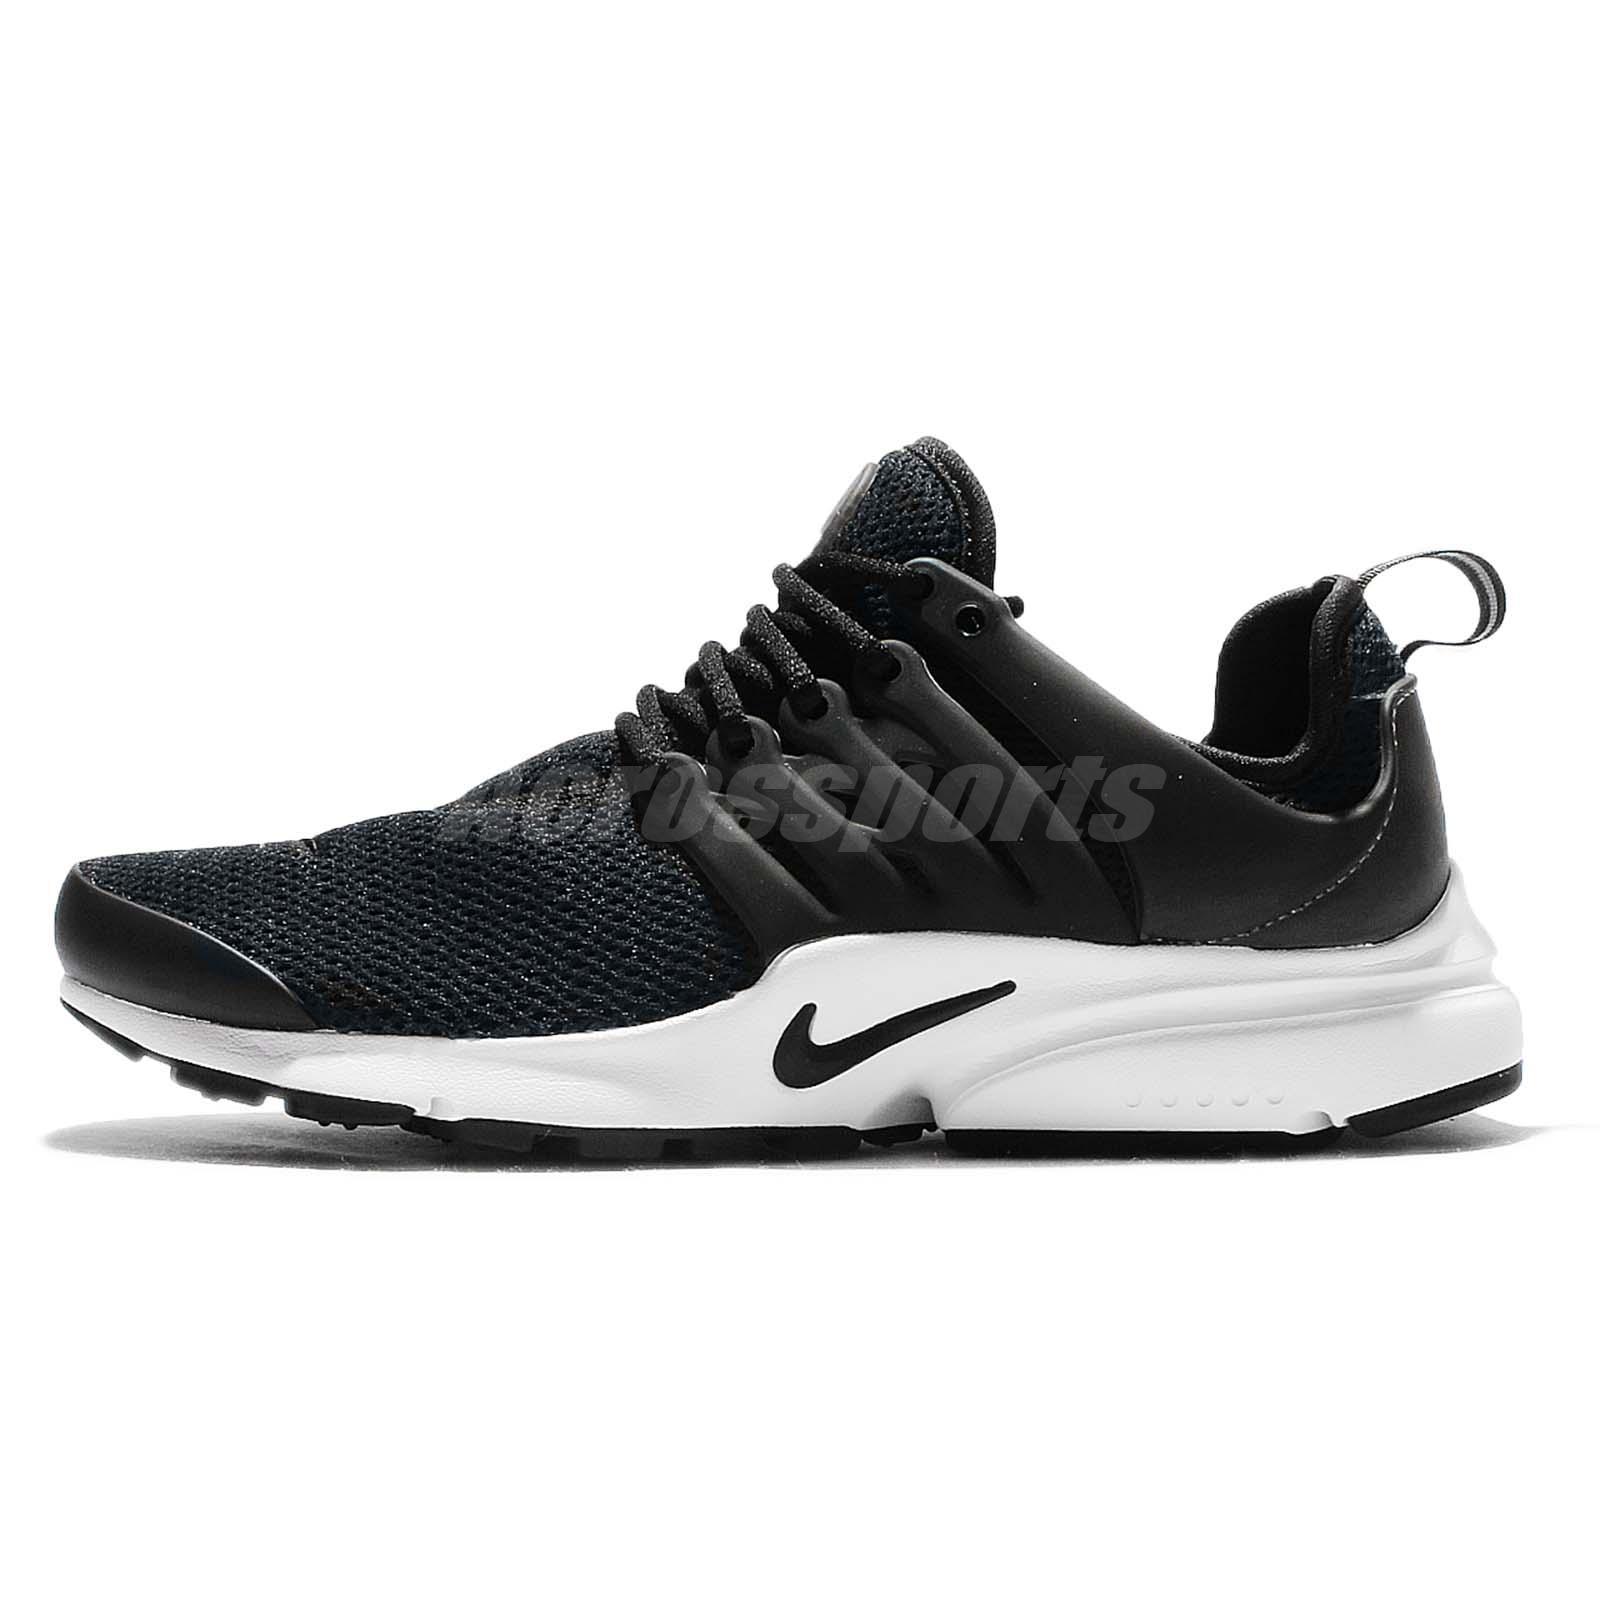 Wmns Nike Air Presto Black White Womens Running Shoes